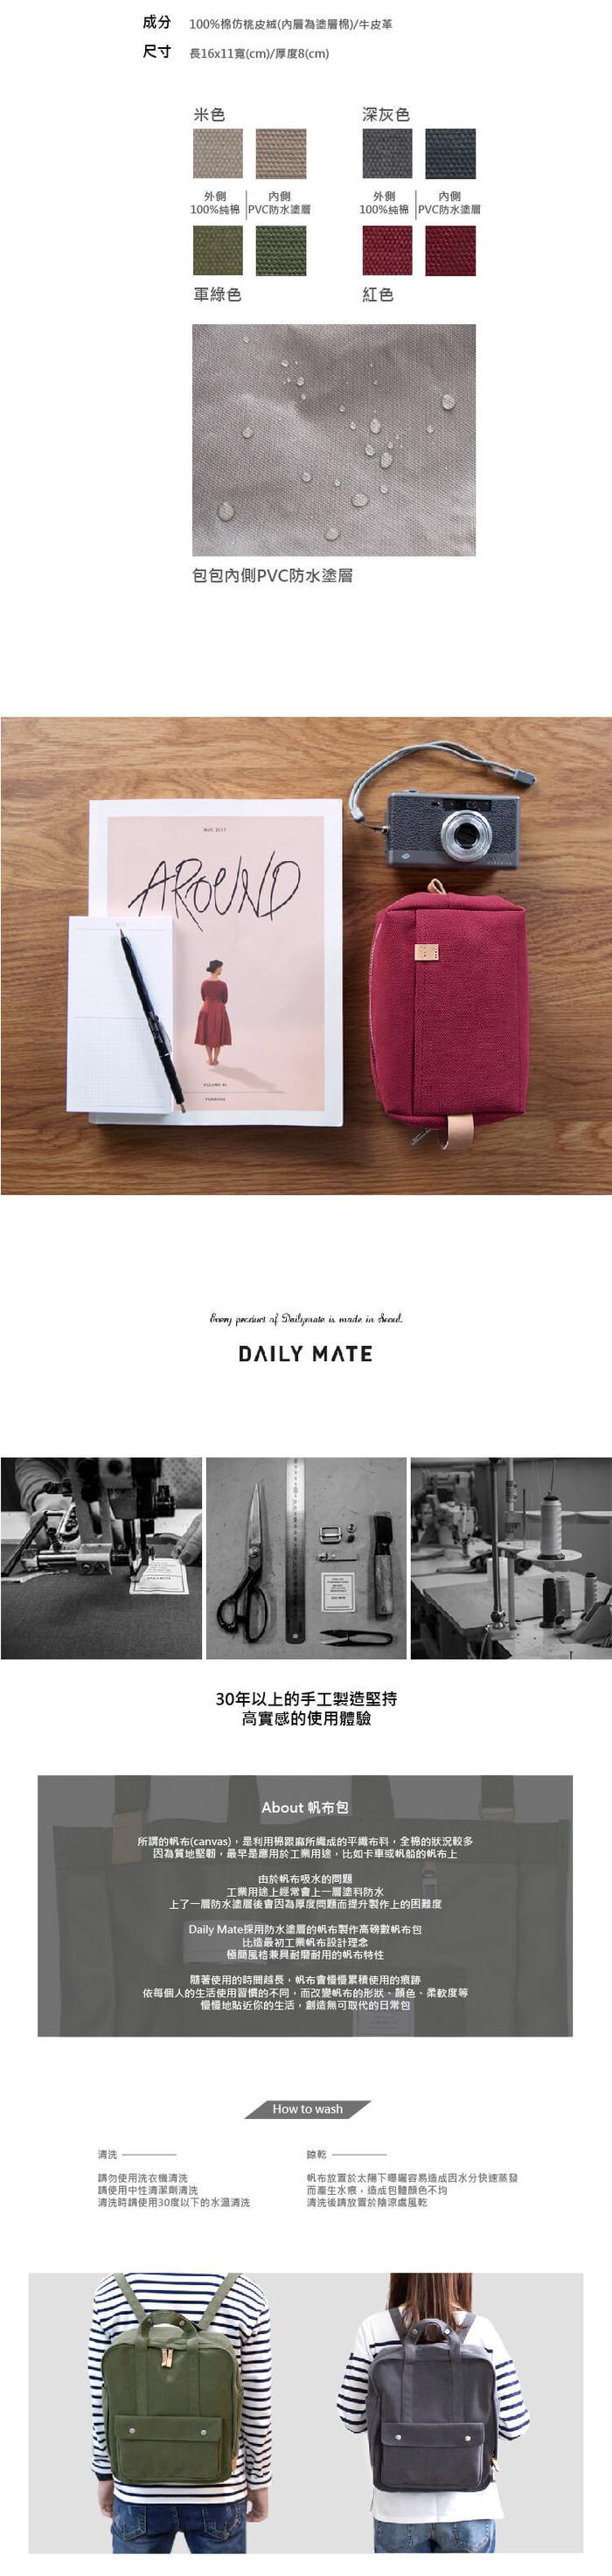 Daily mate|萬用化妝包(深灰)